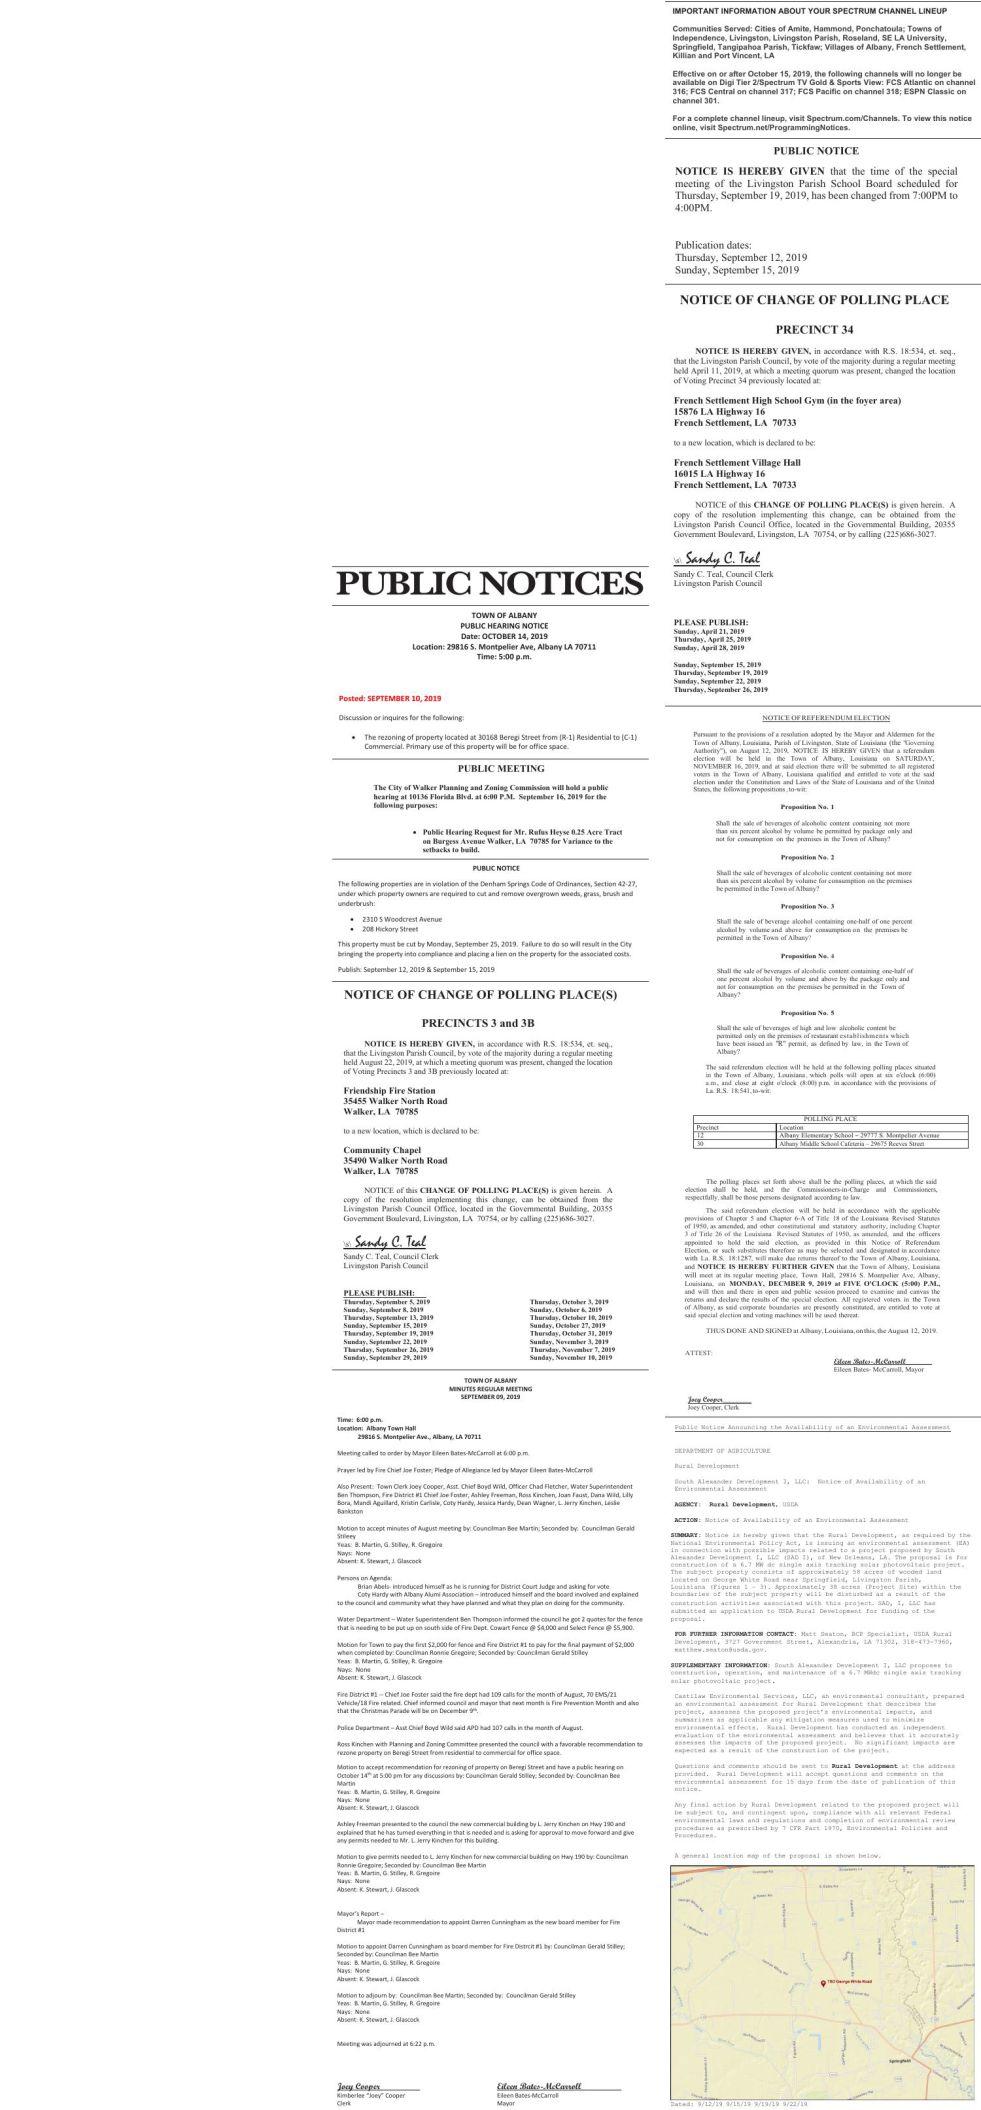 Public Notices published September 15, 2019